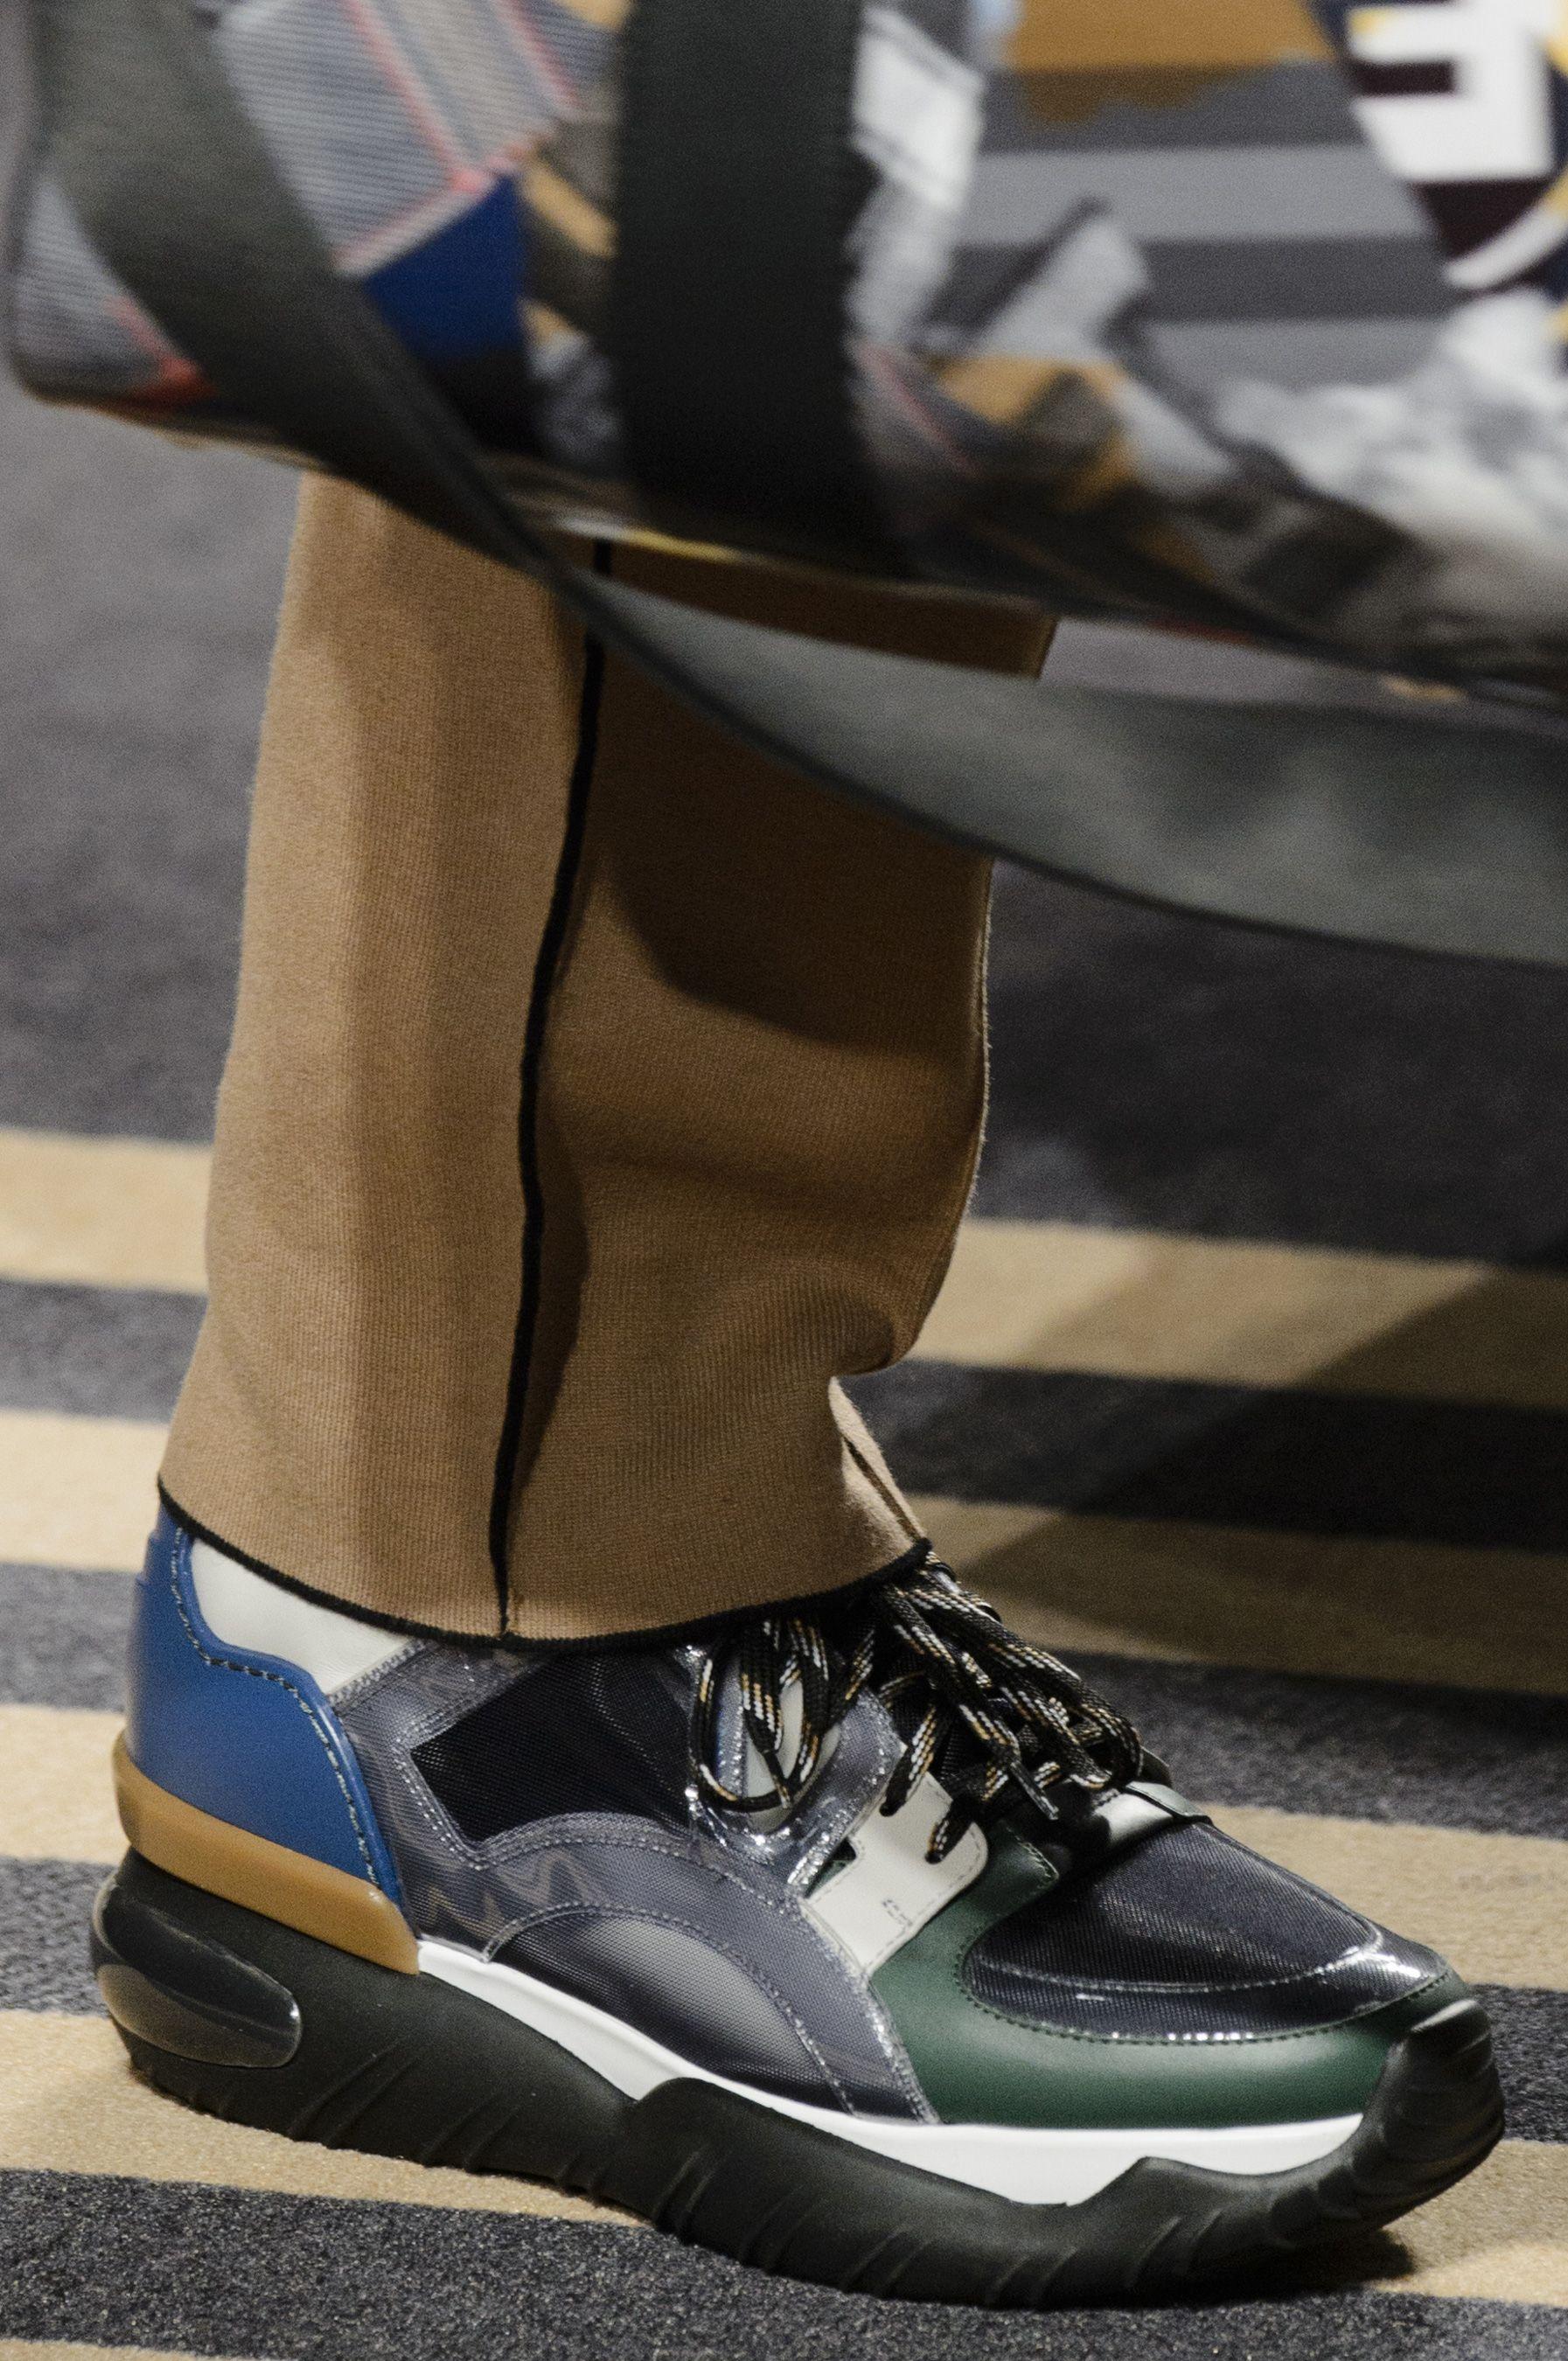 Men fashion show, Fendi shoes